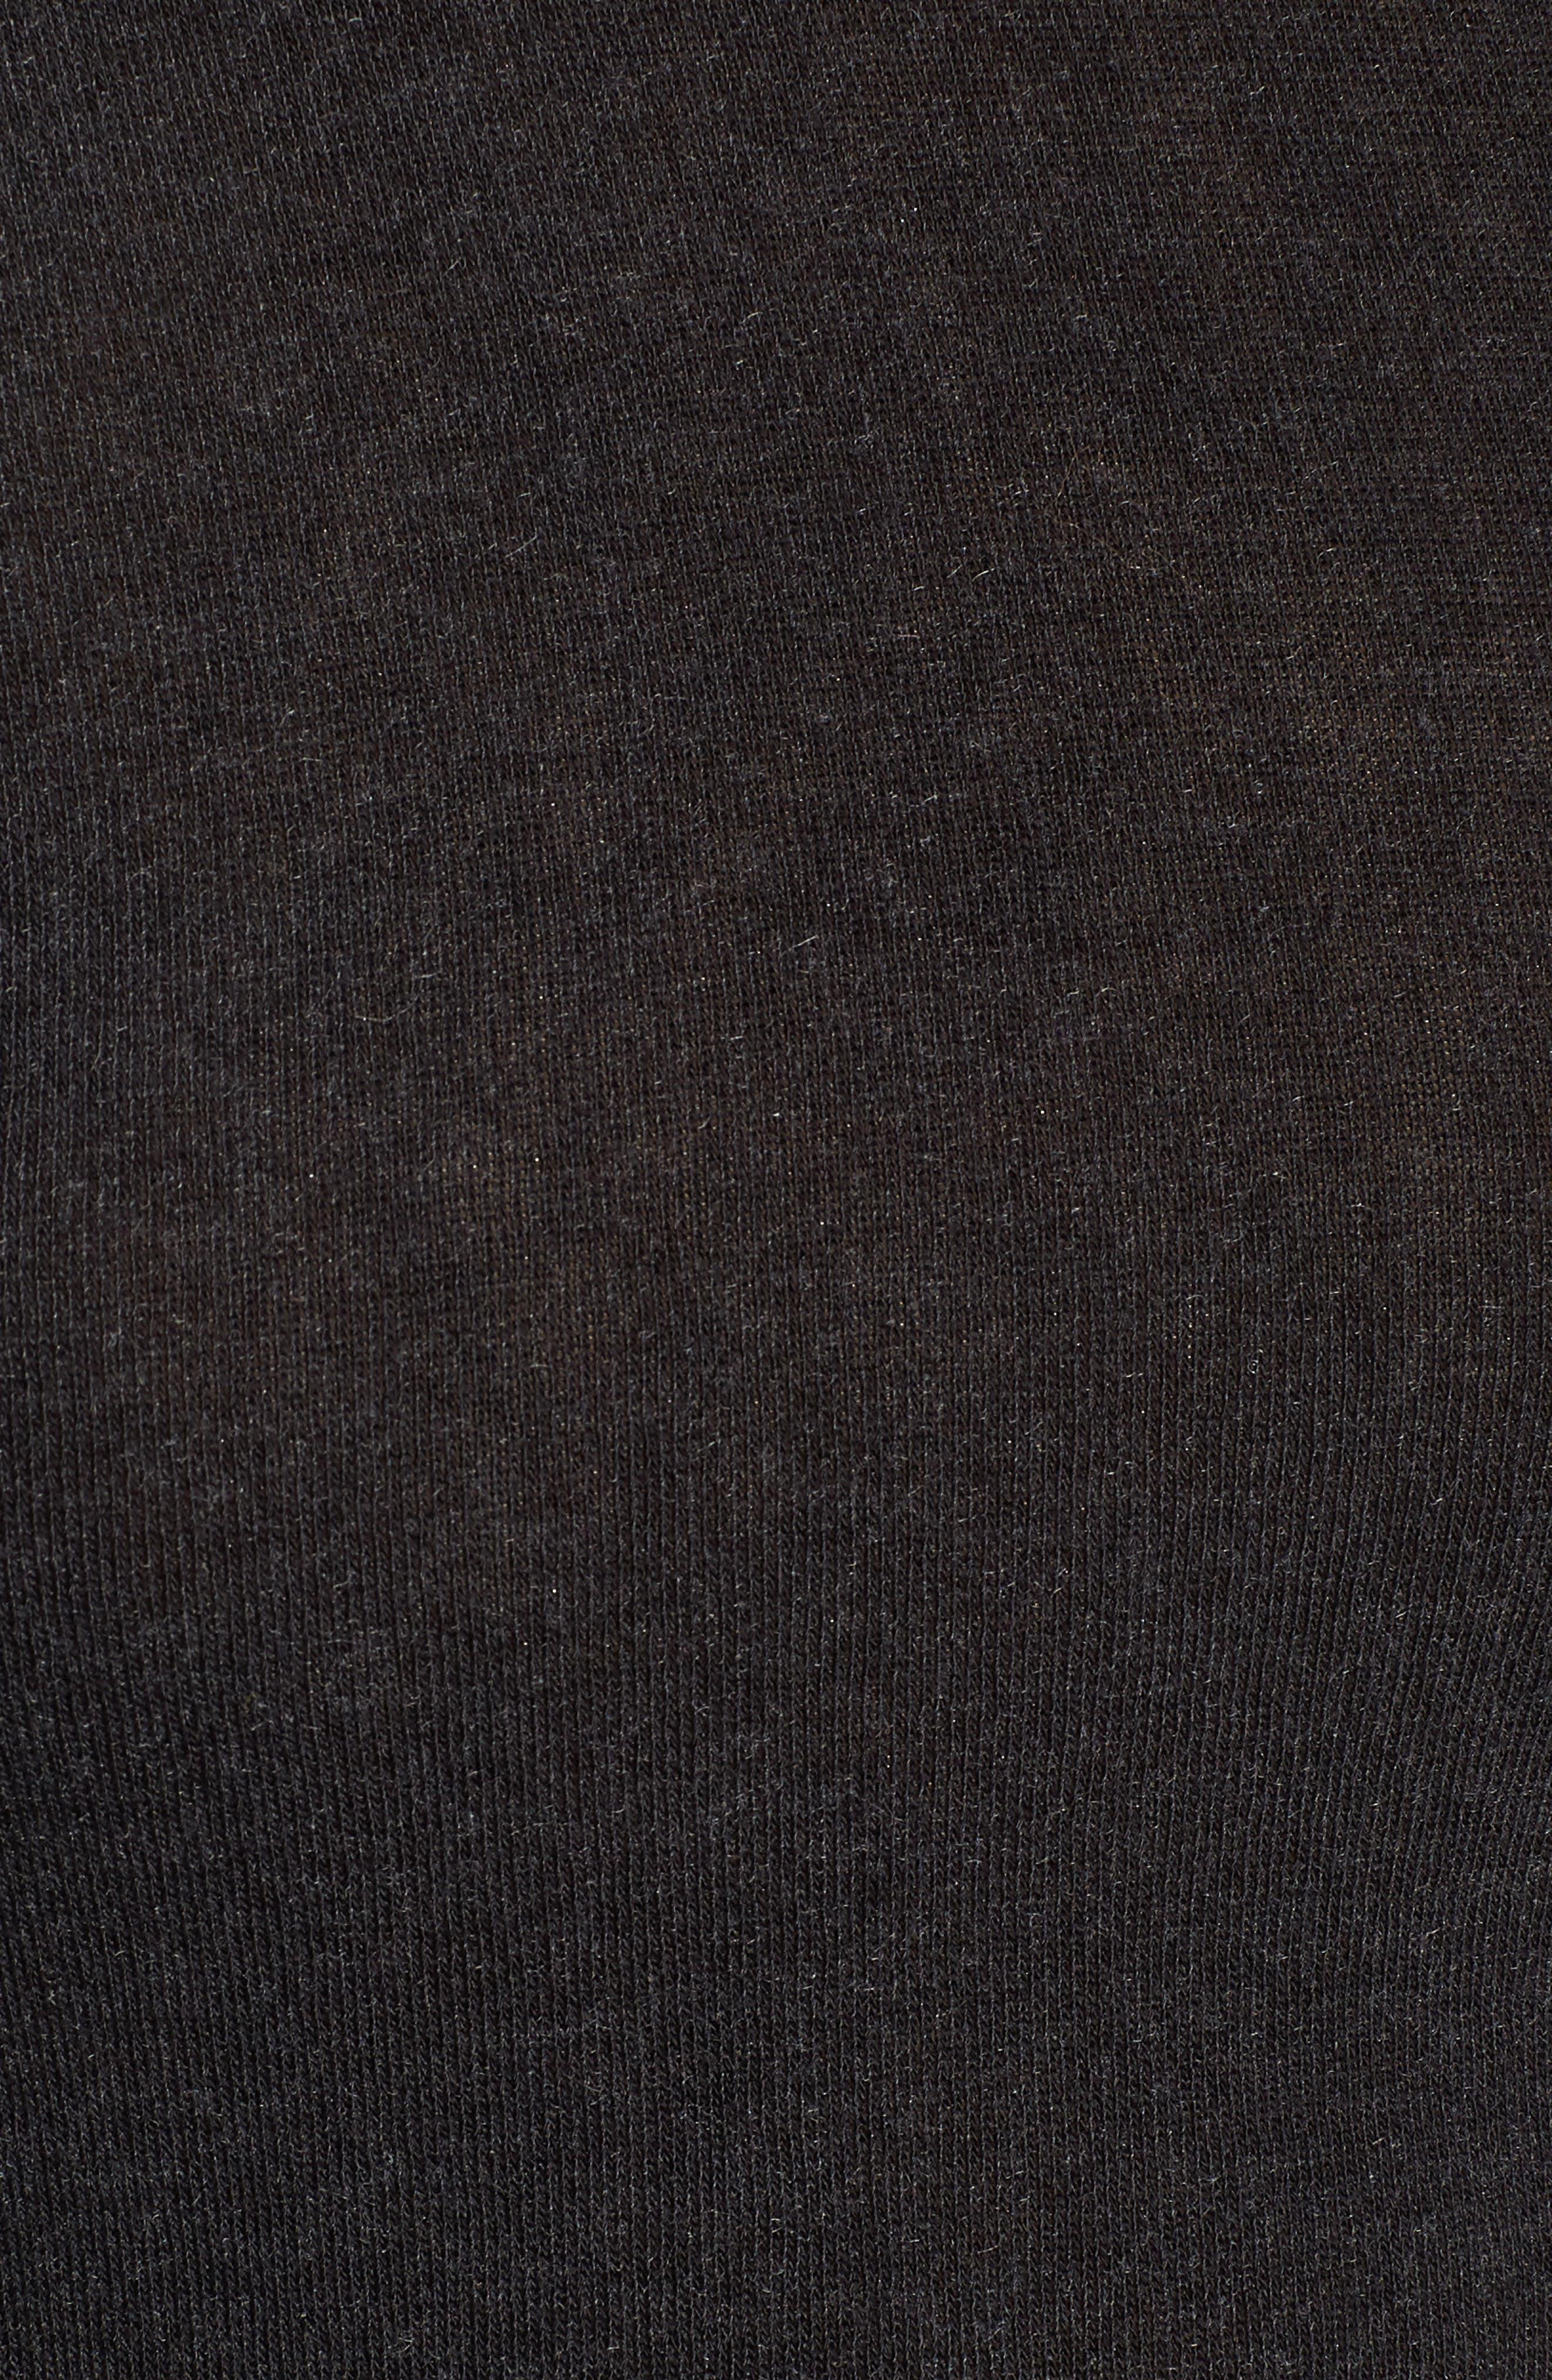 Long Sleeve Tee,                             Alternate thumbnail 5, color,                             001